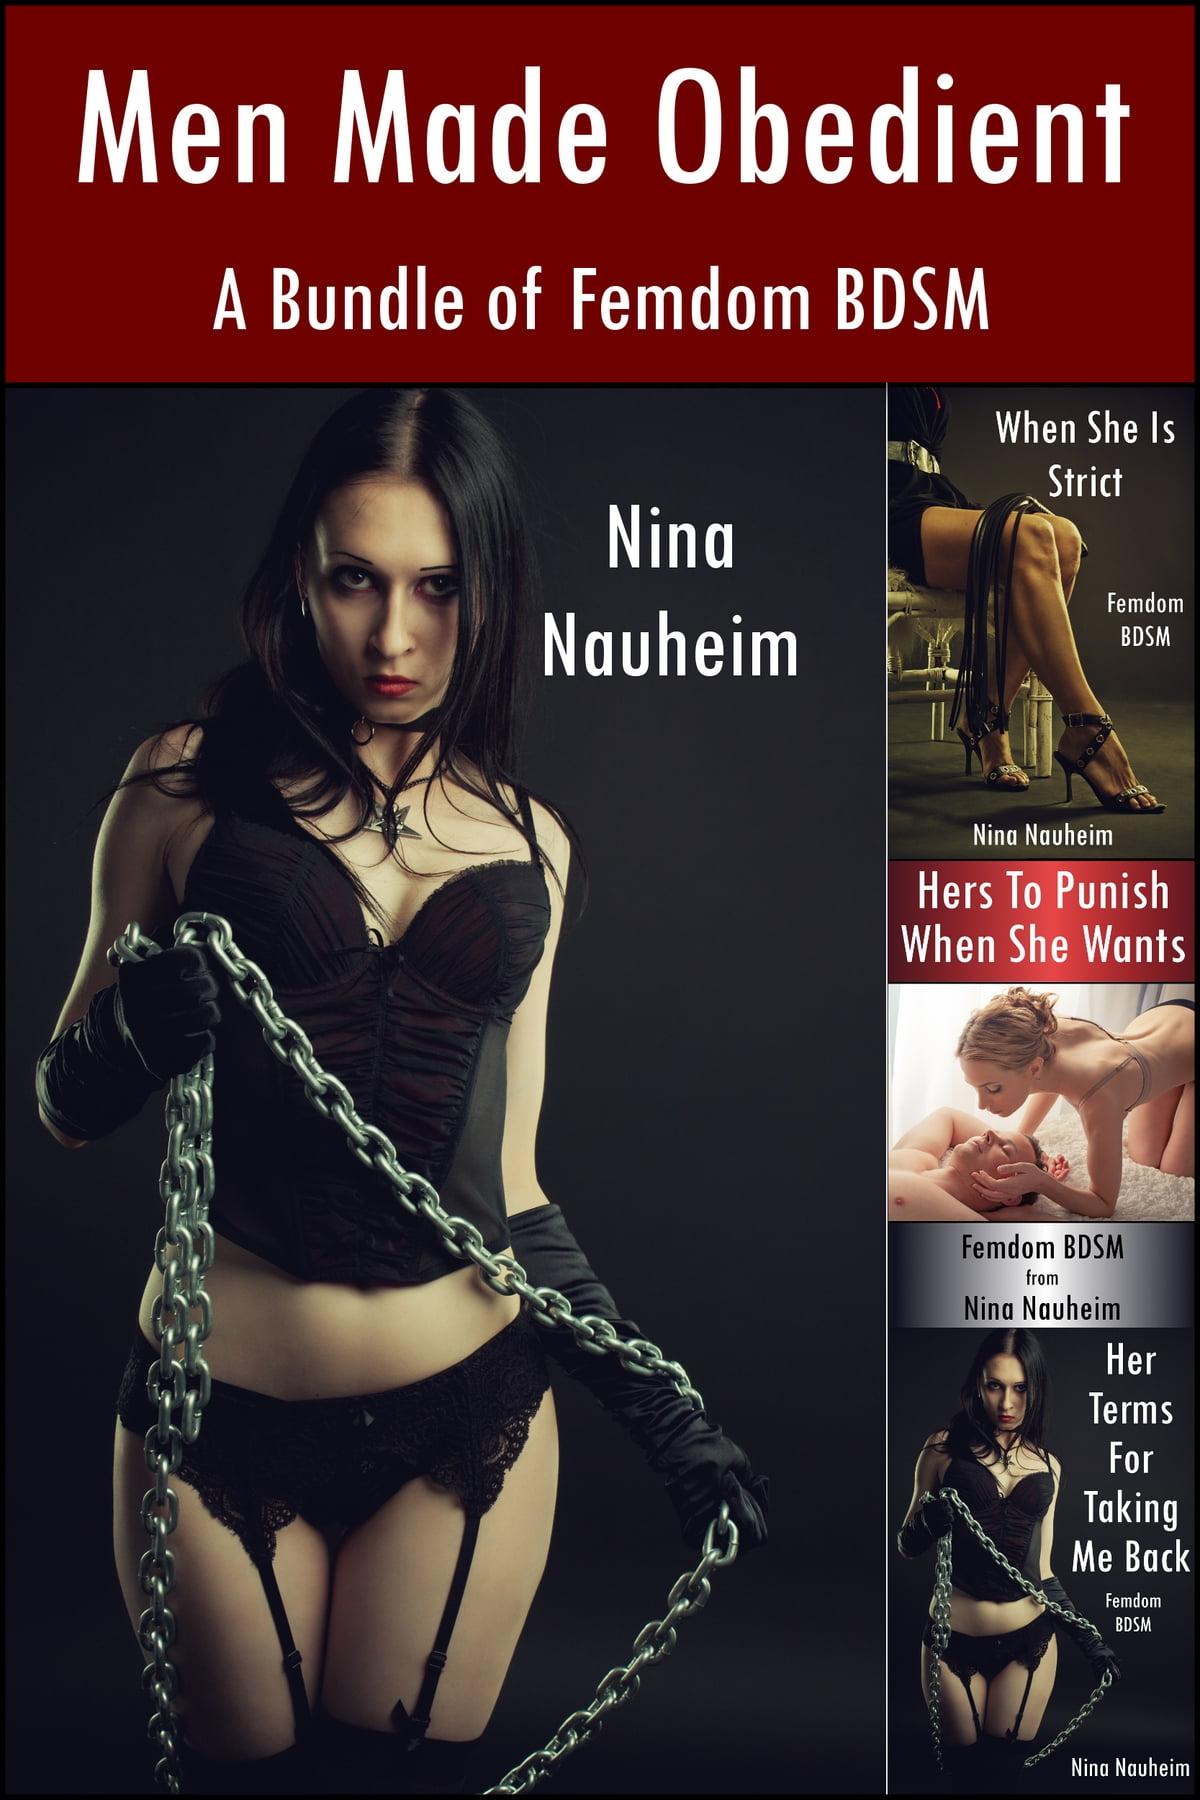 Men Made Obedient A Bundle Of Femdom Bdsm Femdom Bdsm Spanking Degradation Ebook By Nina Nauheim 9781310115370 Rakuten Kobo